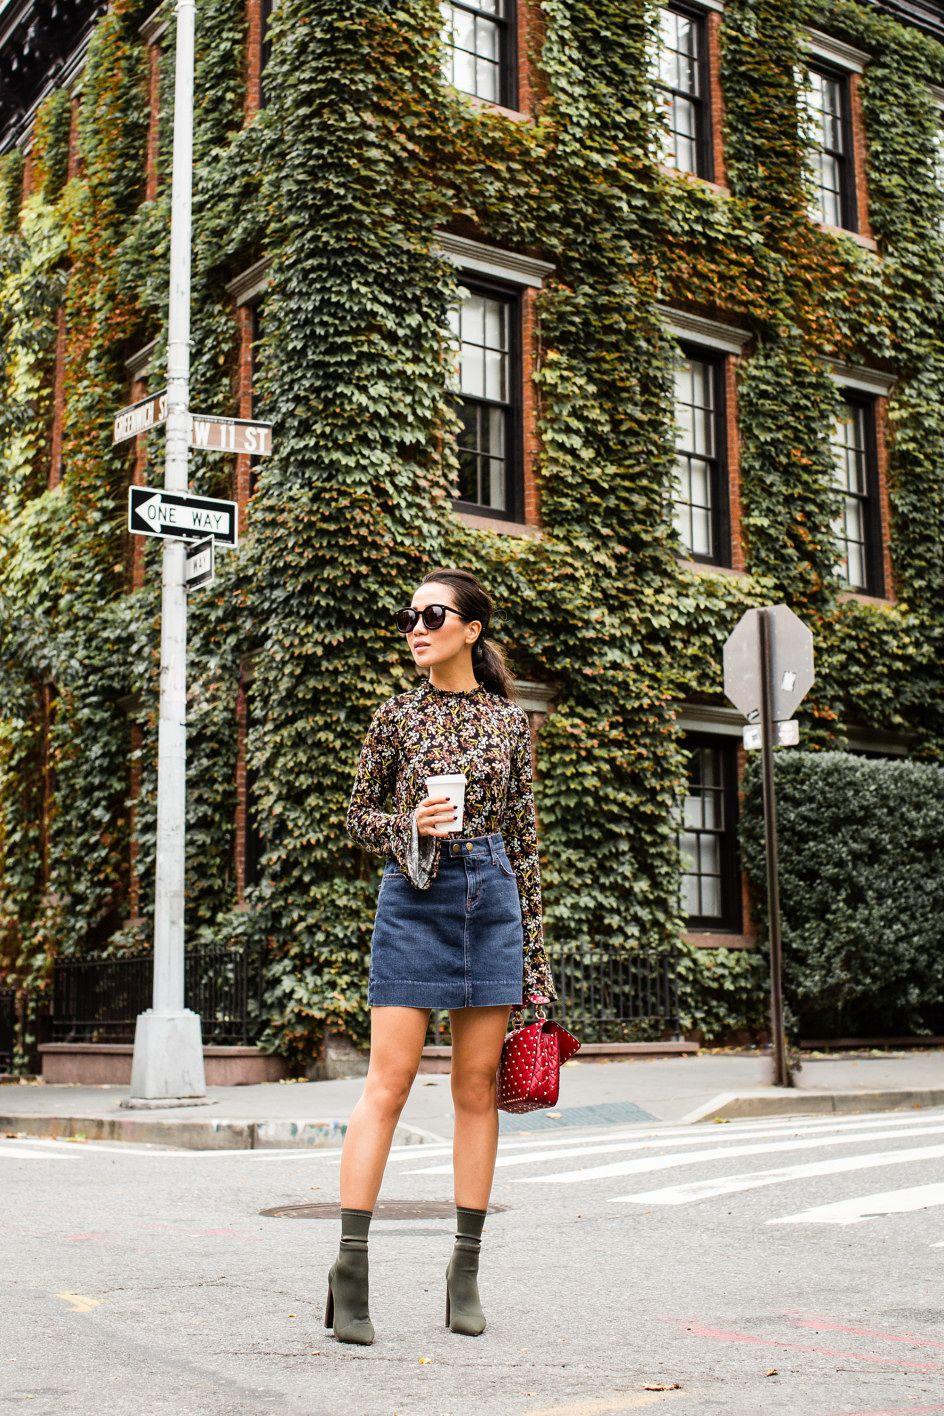 Wall Flower :: Floral top & Denim skirt | Floral tops, Denim